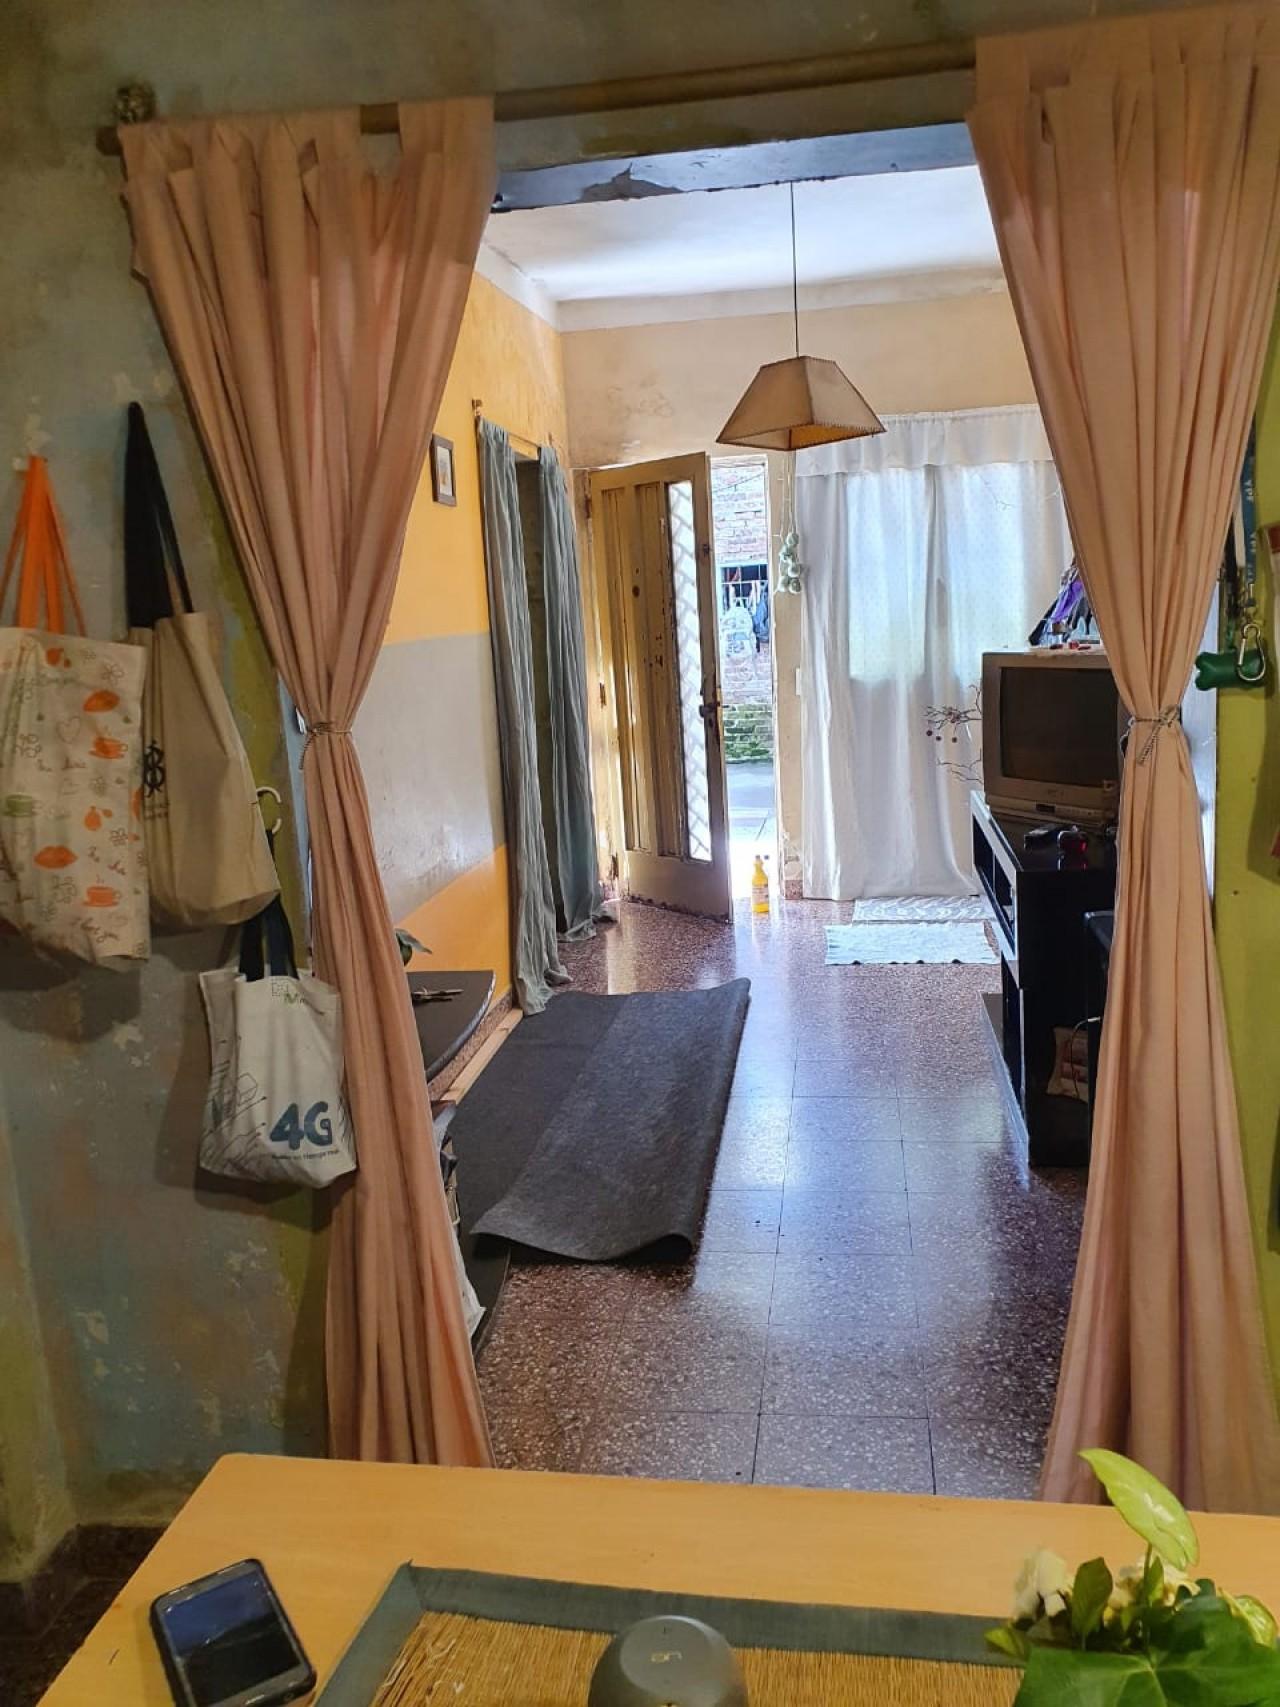 casa 3 ambientes + deposito o  cocheras 0 galpon  VENTA URGENTE   villa ballester , partido de san martin . pcia. de buenos aires